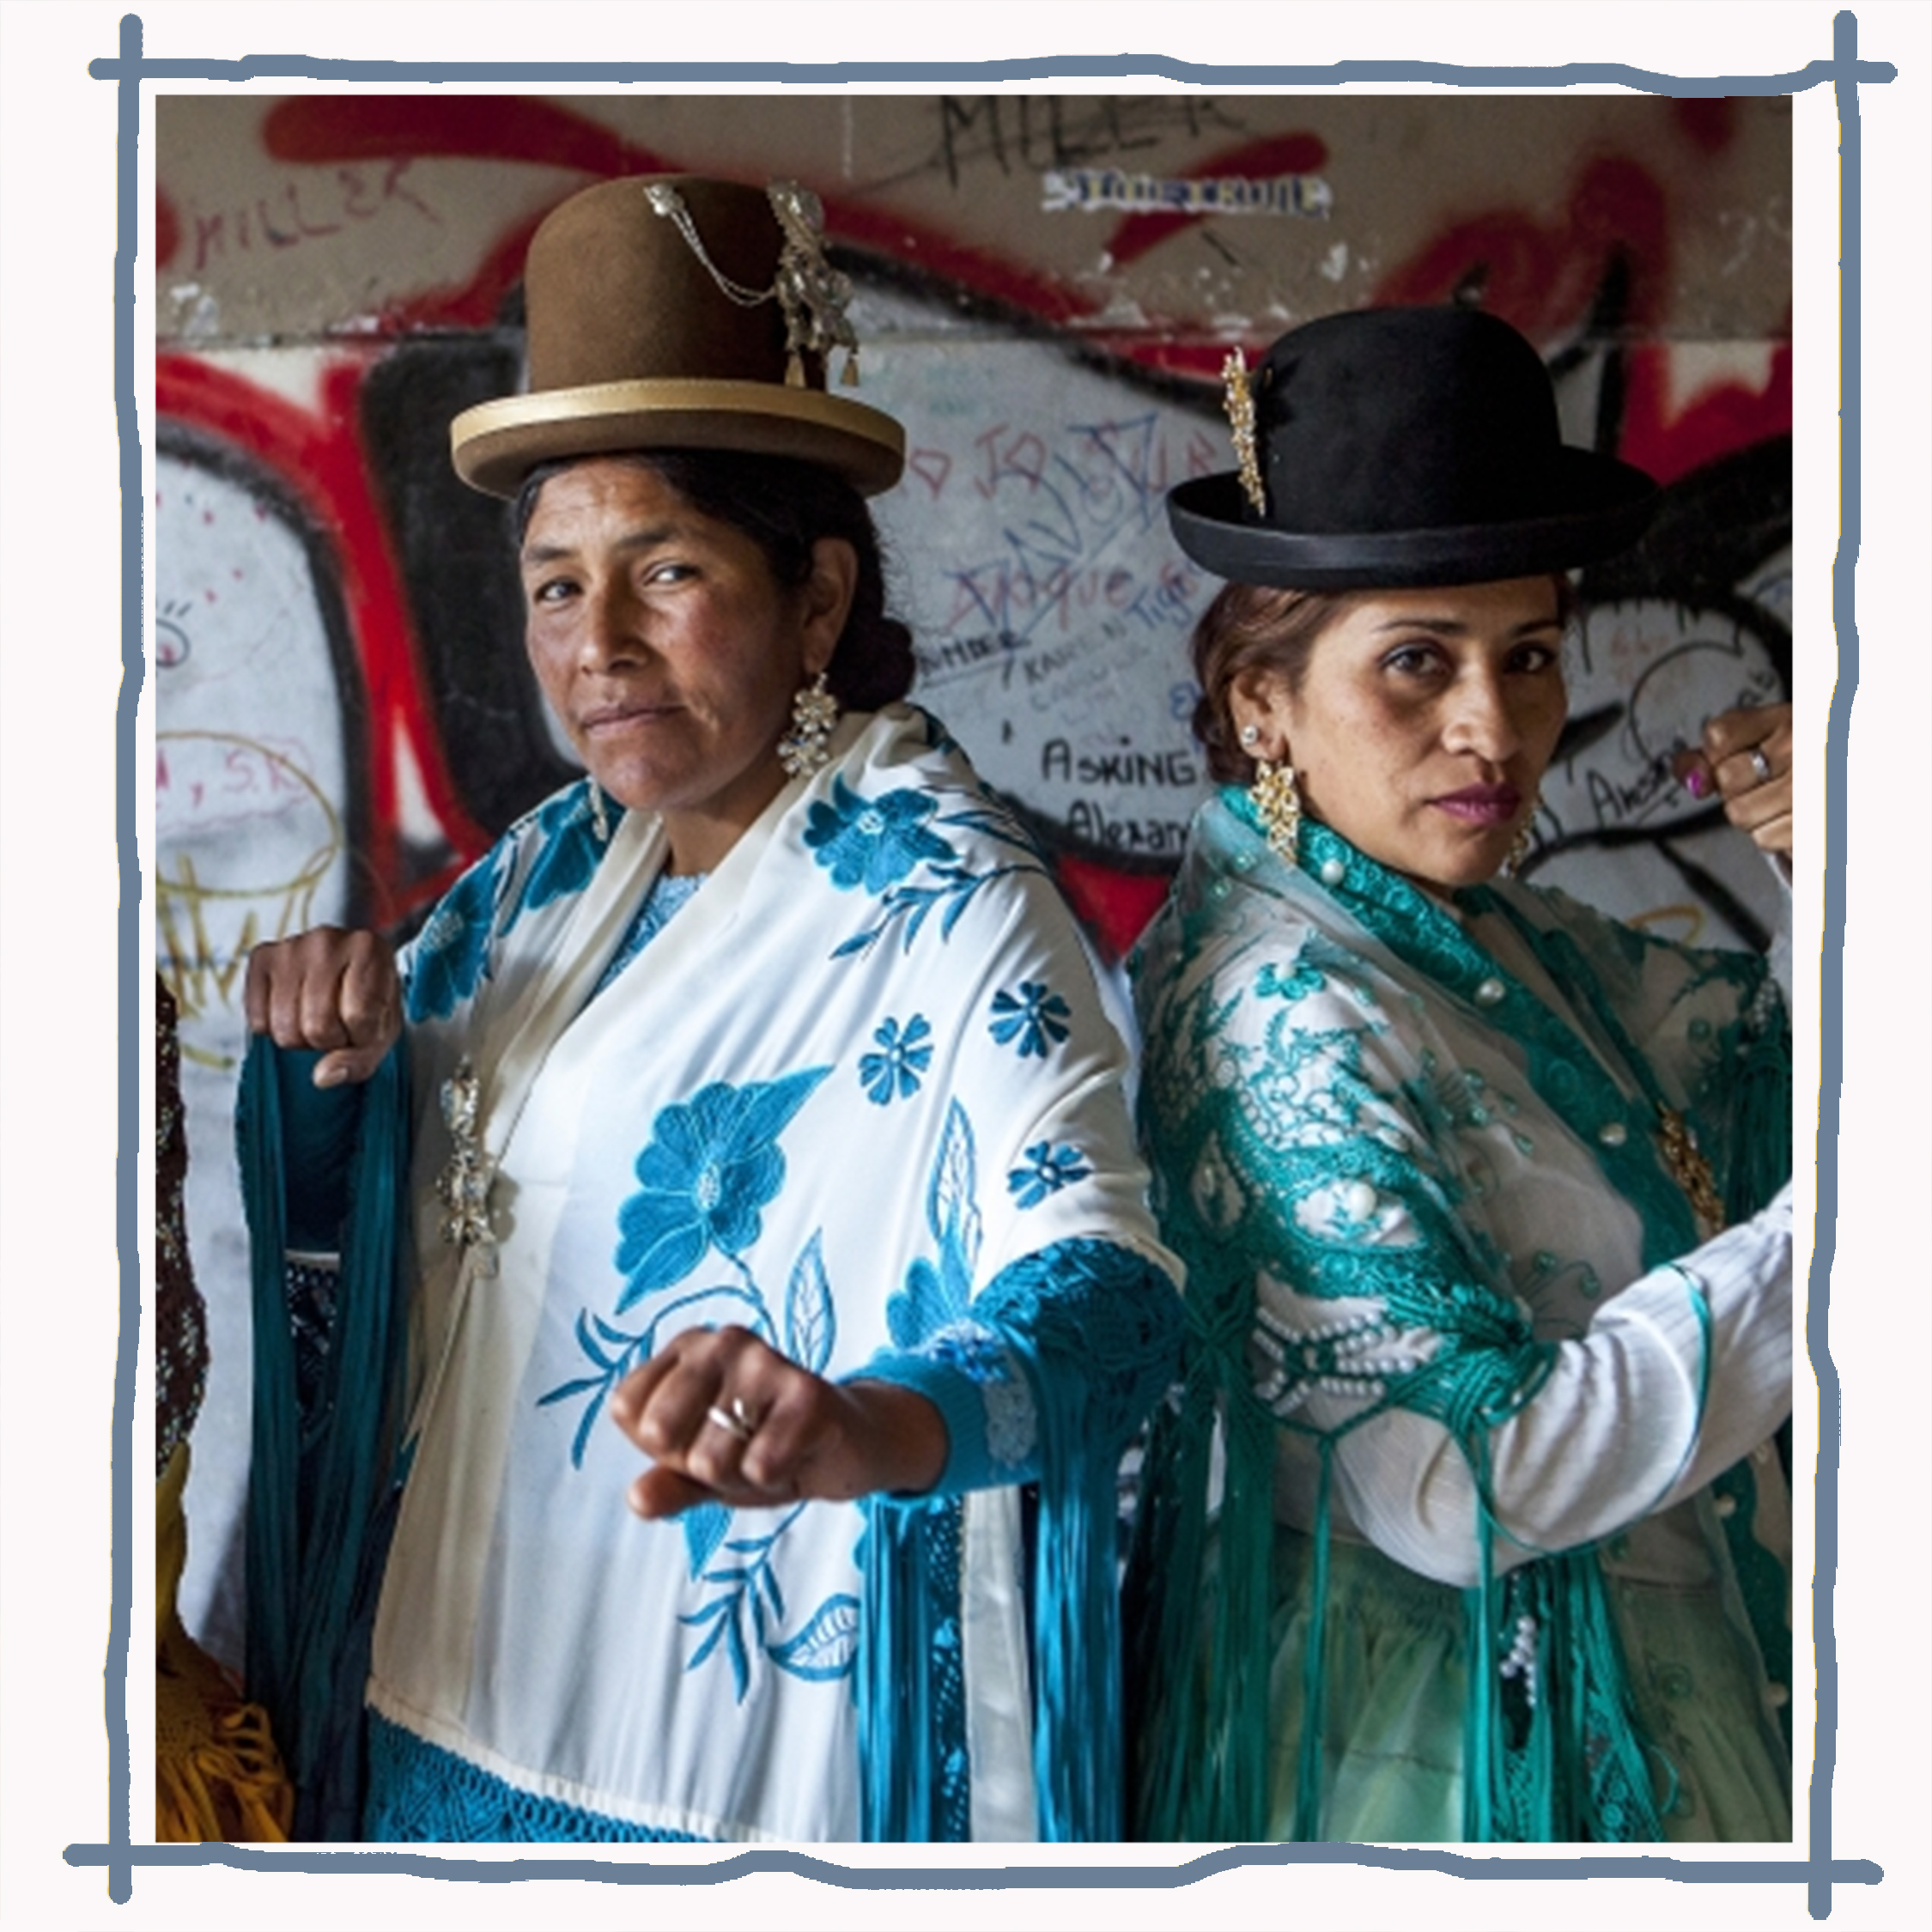 Indigenous Armaya women of Bolivia or 'Cholitas' in traditional dress, ready to enter the ring  Image:  21 la revista cristiana de hoy